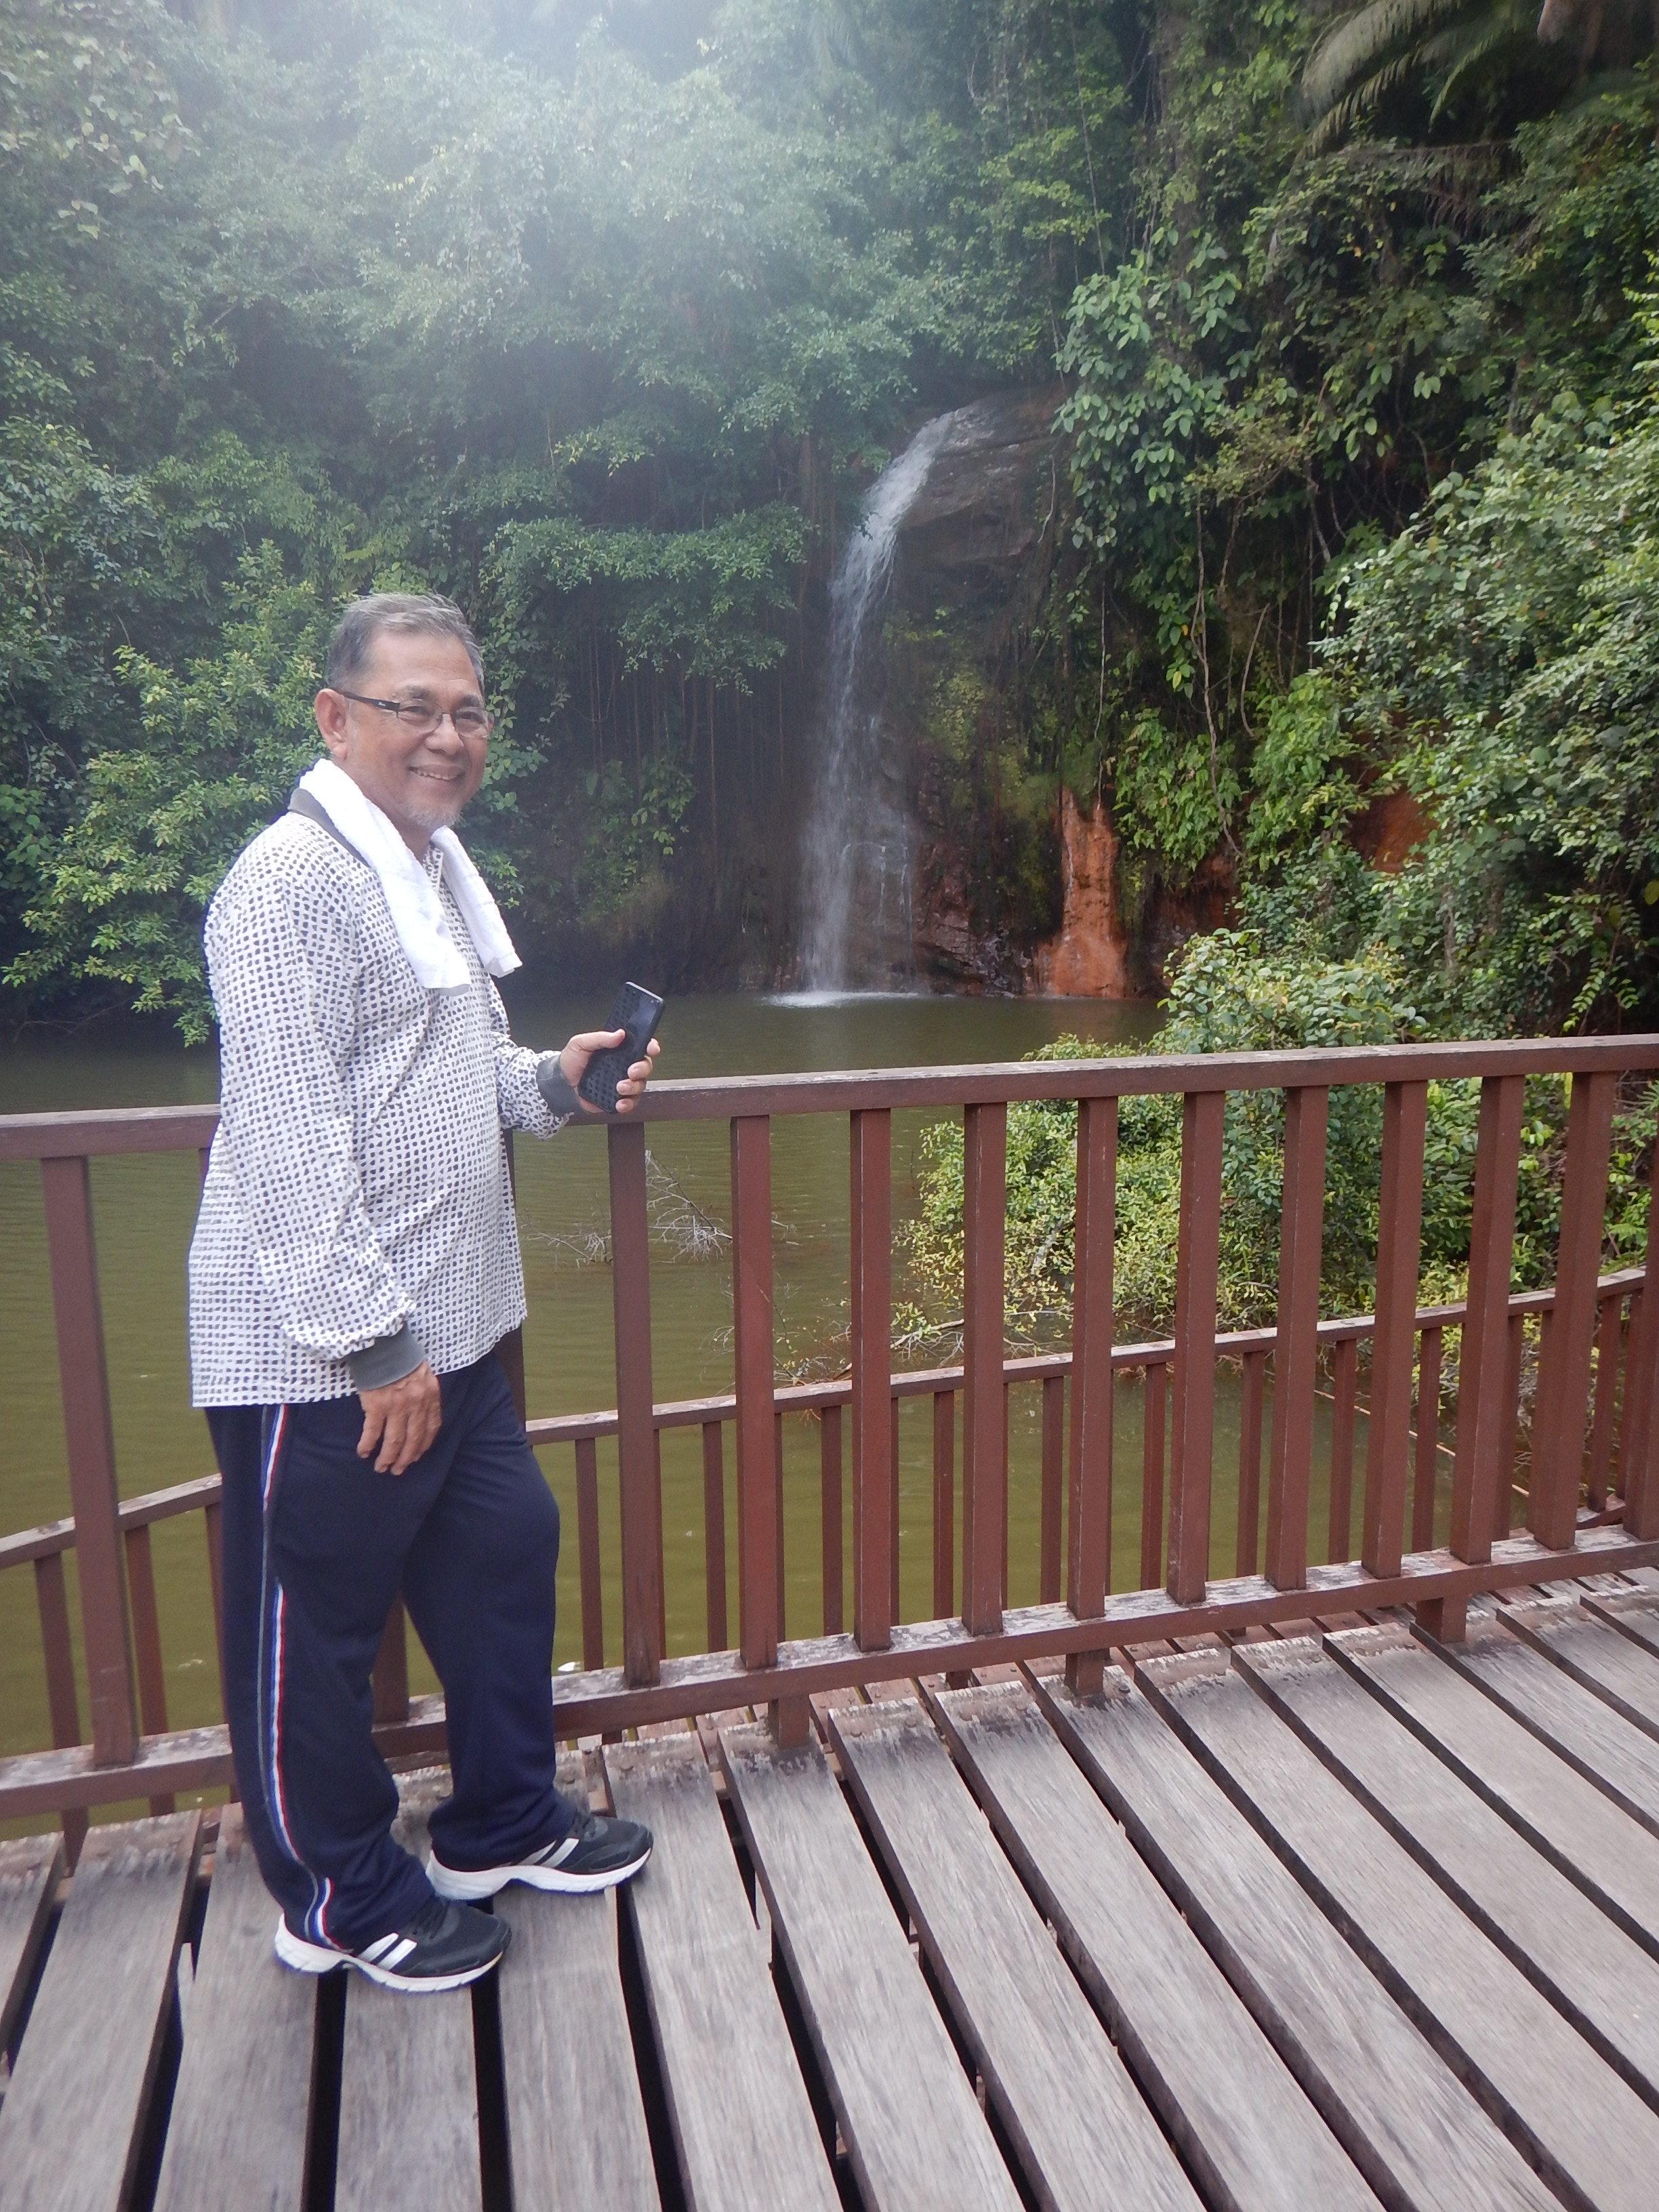 Aji at the waterfall.